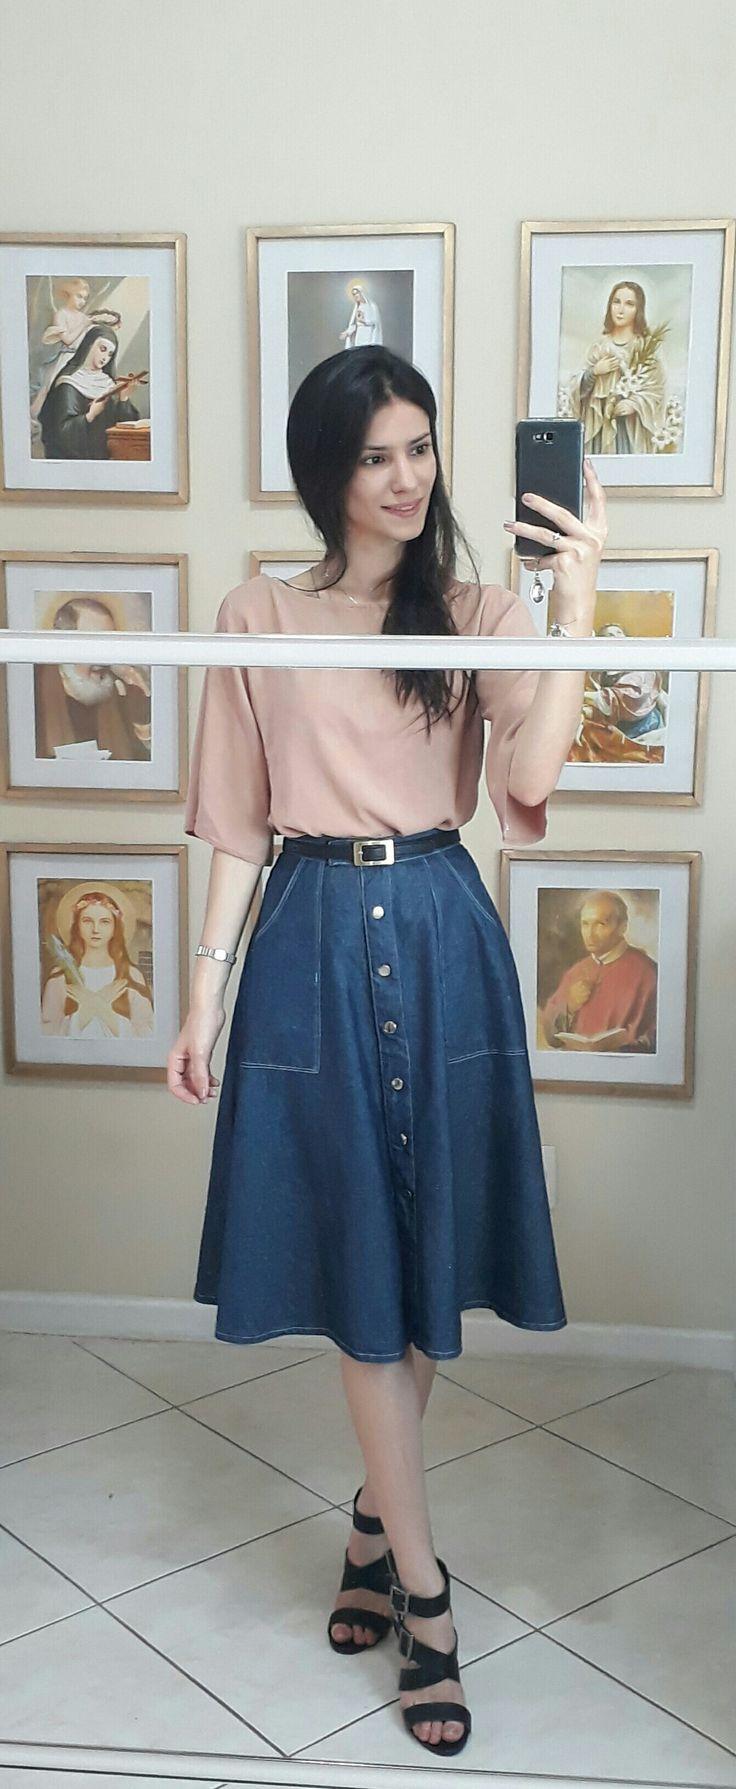 Pink blouse and denim midi skirt | Loja Modesta, Modestia, Modestia catolica, look loja modesta, modéstia